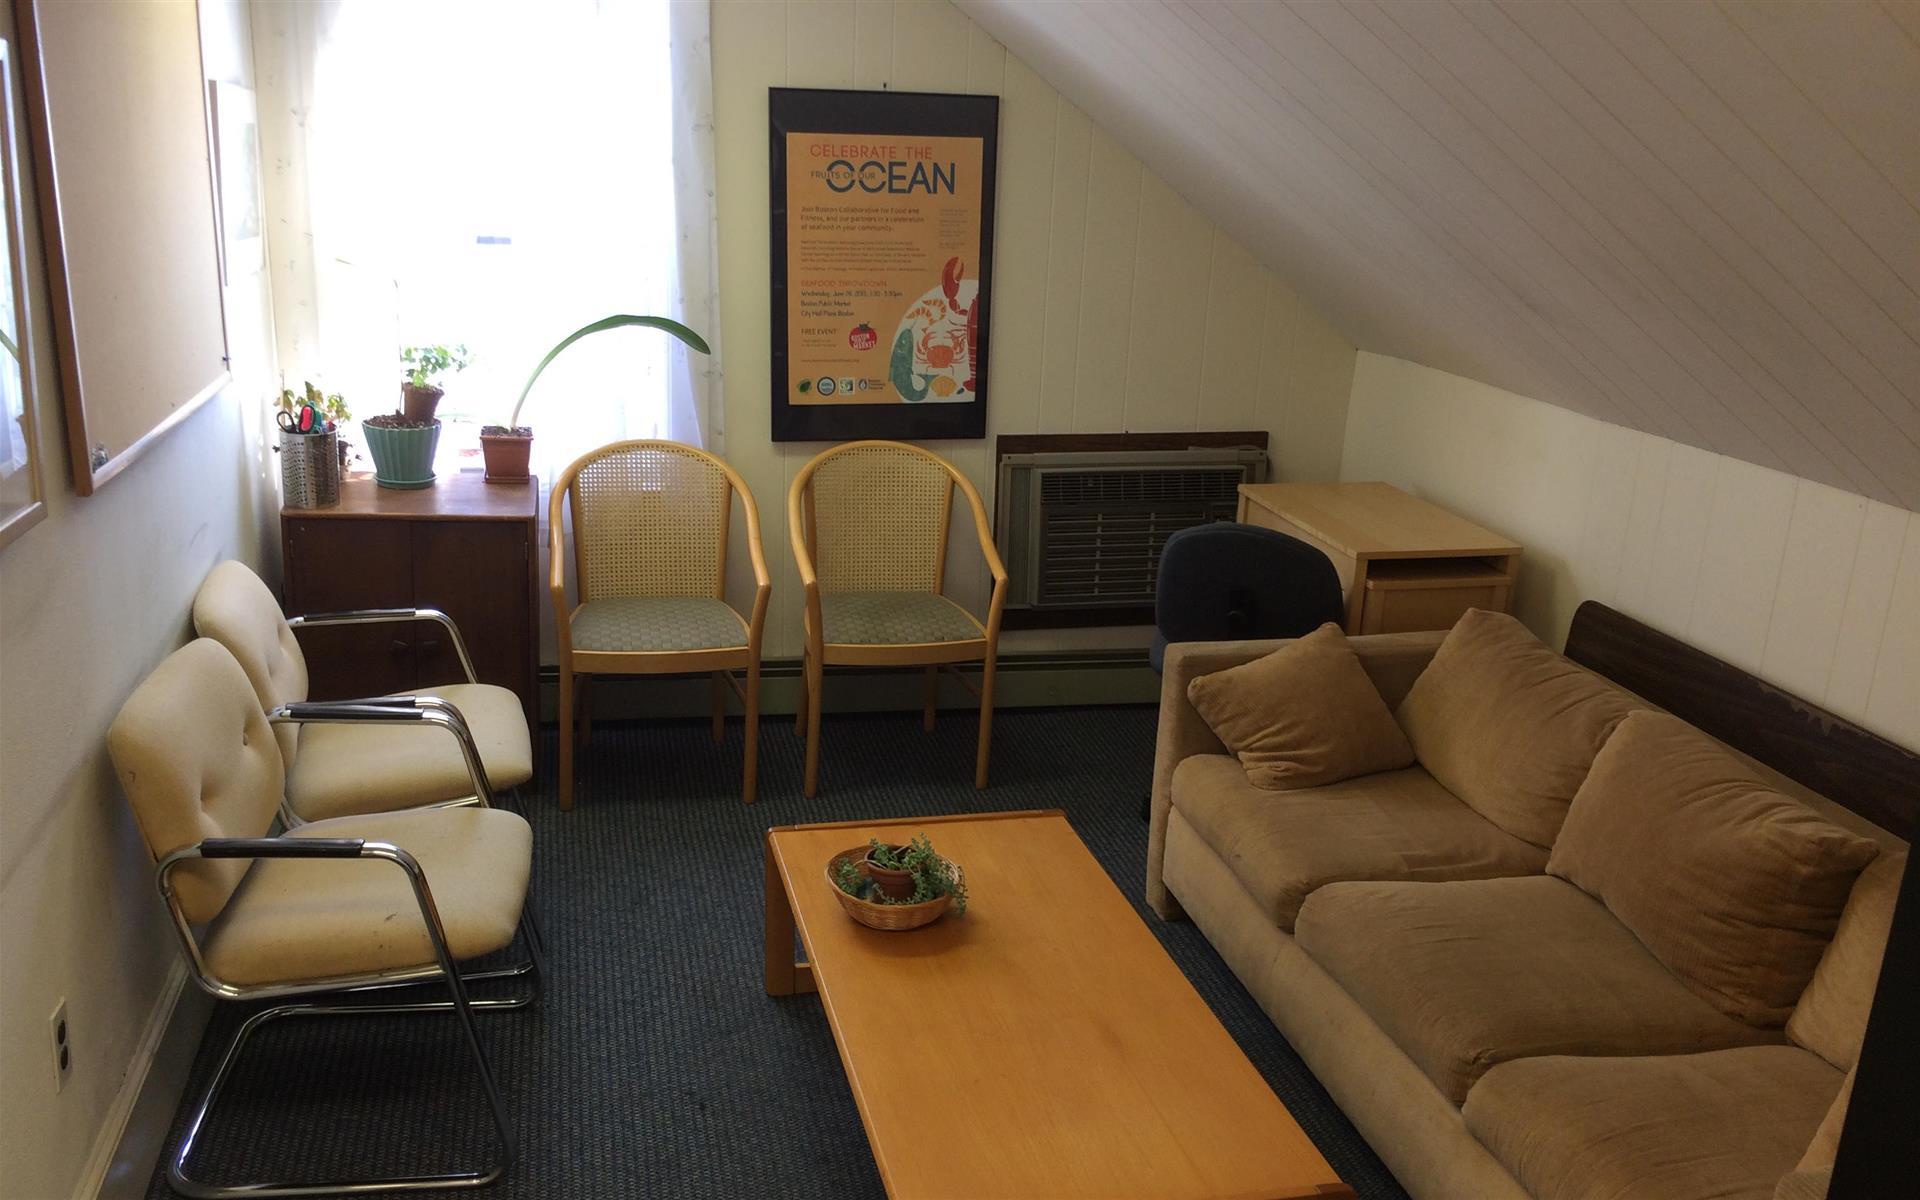 Harvard Square Meeting/Office - Meeting Room/Office Space